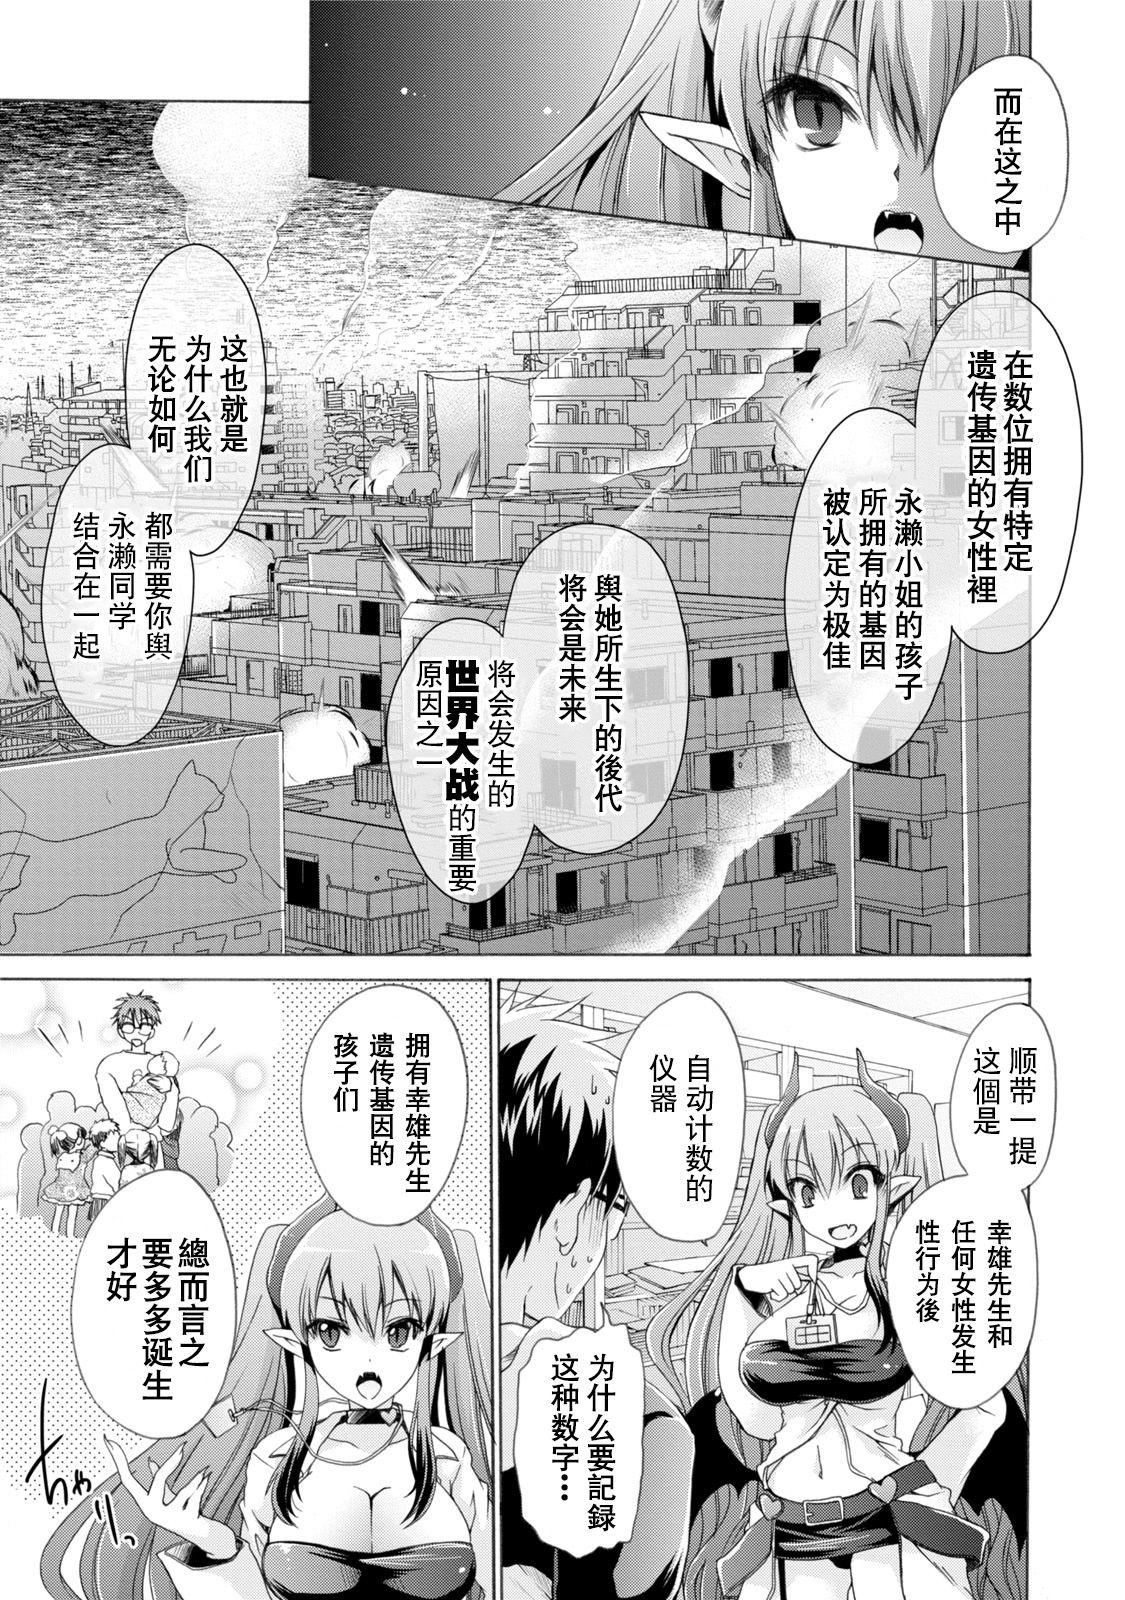 [Shinonome Ryu] Ore to Kanojo to Owaru Sekai - World's end LoveStory ch.1-9 [Chinese] [爱弹幕汉化组] [Digital] 32